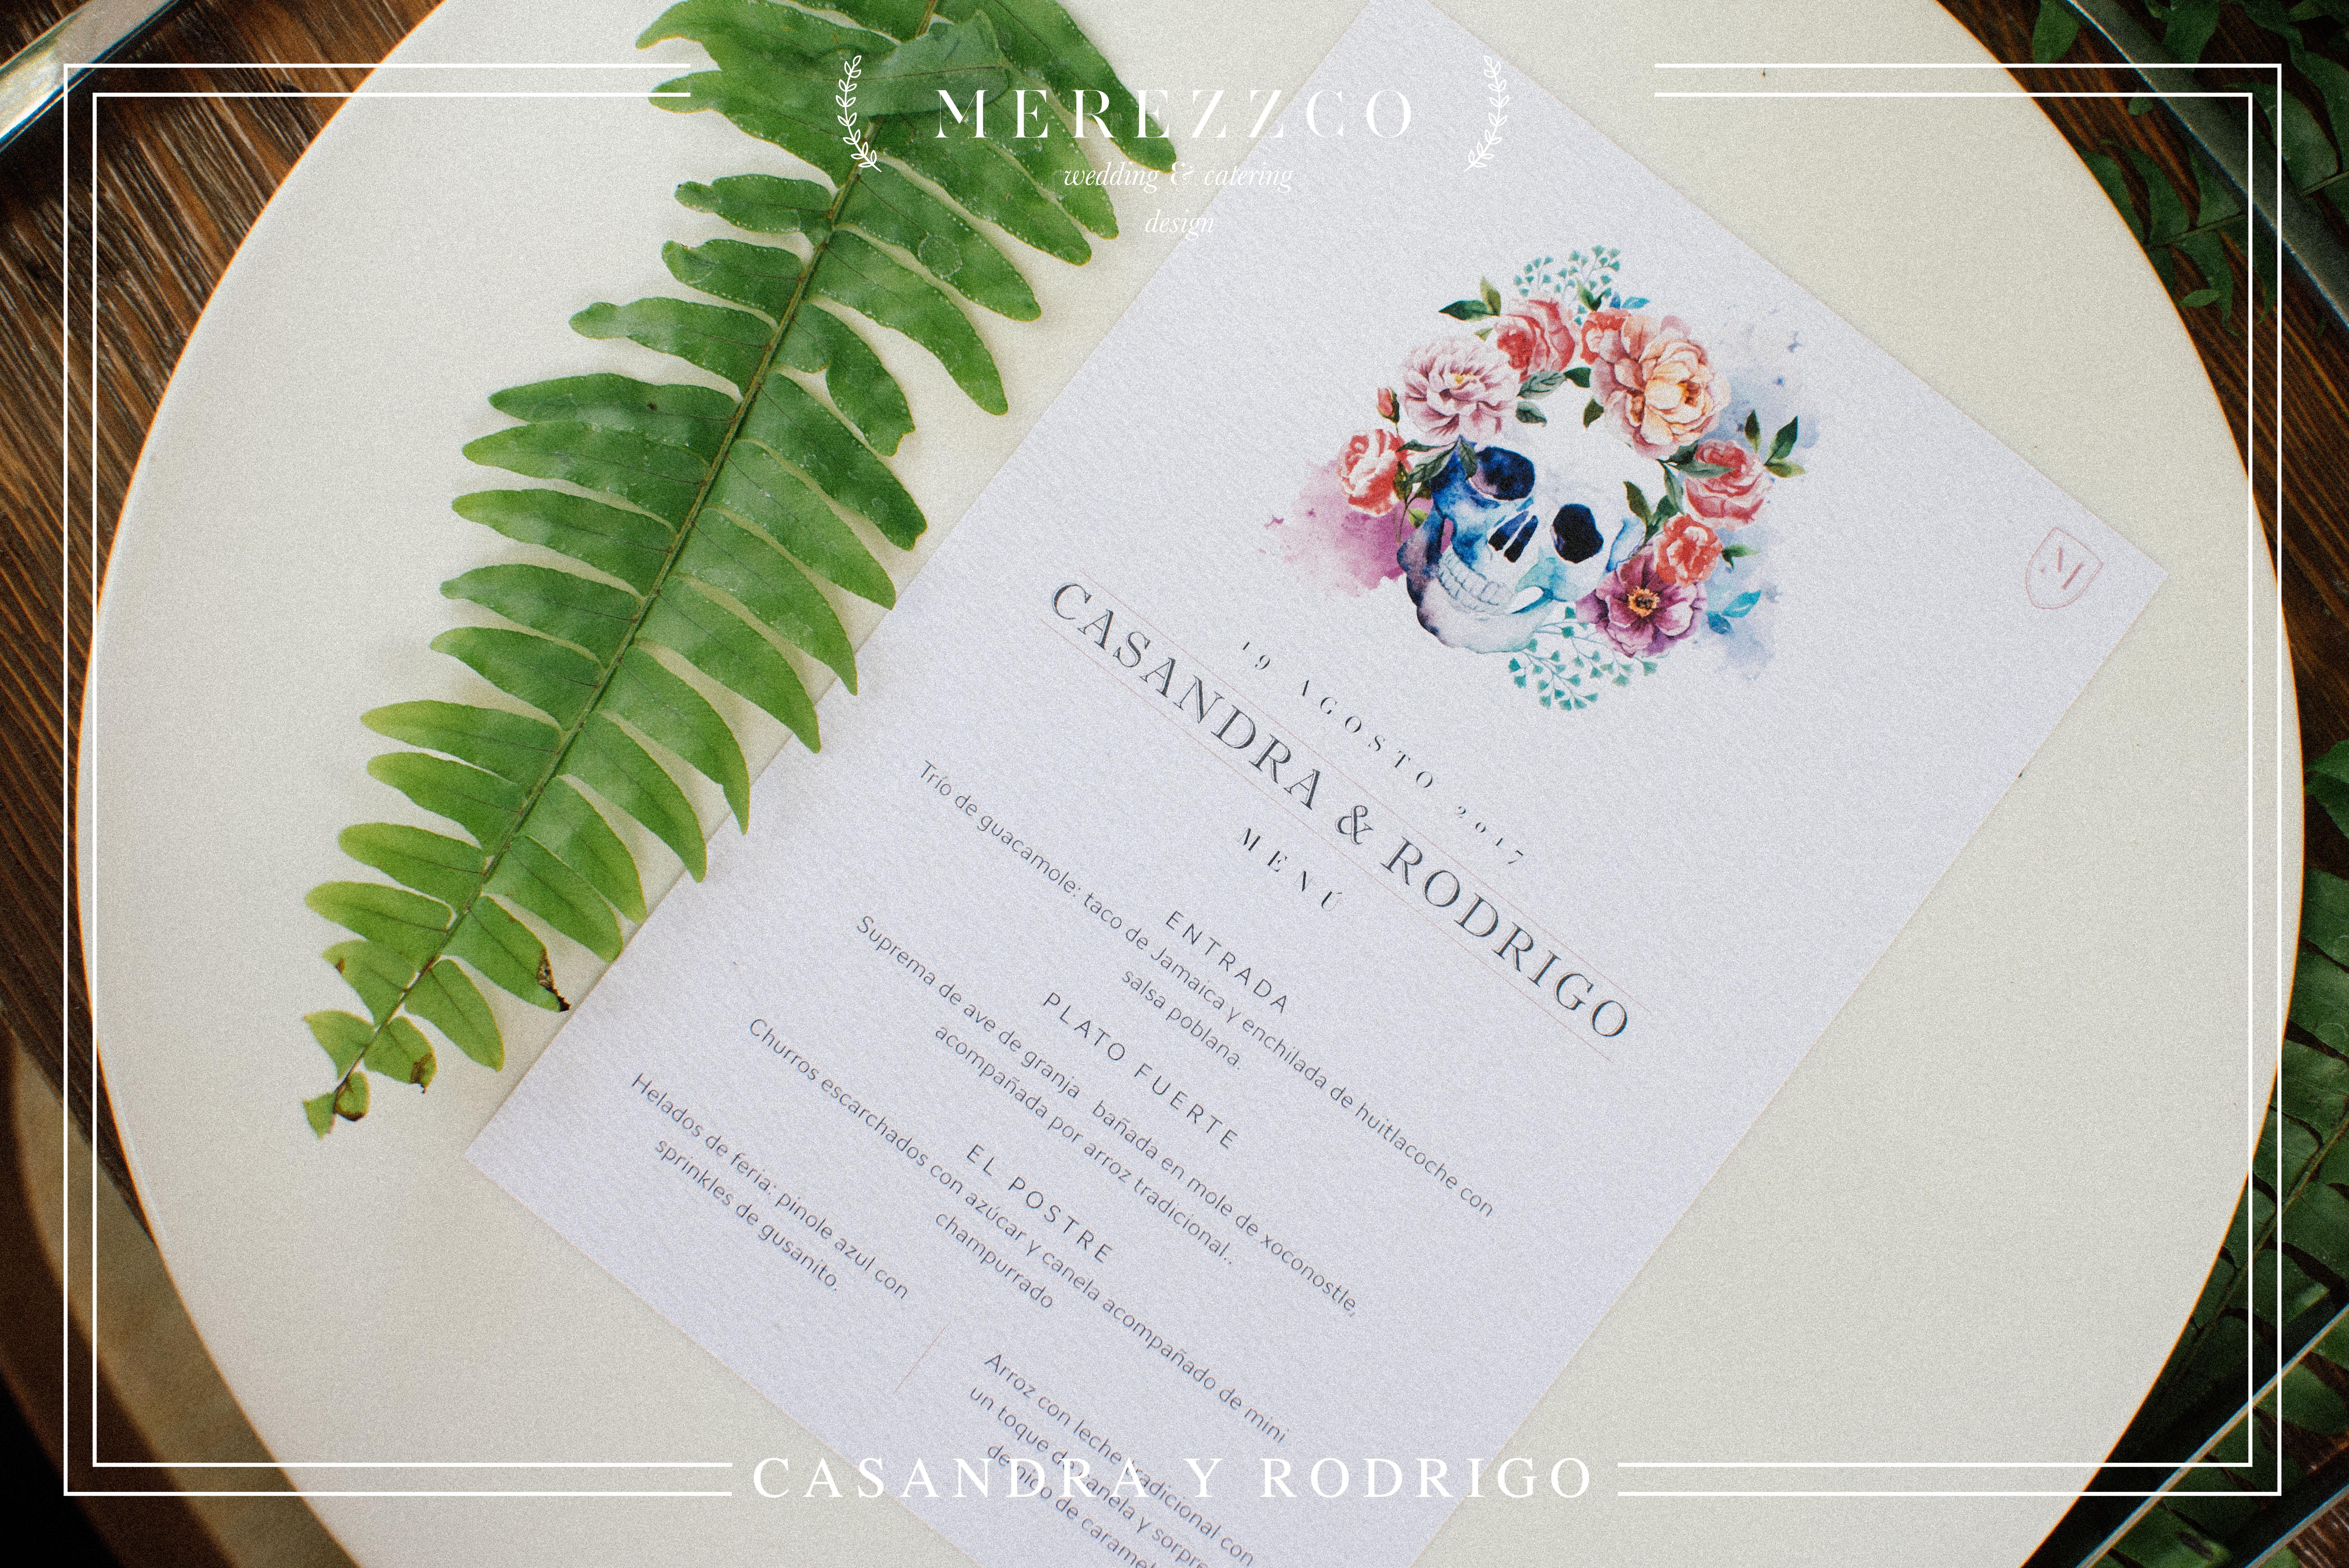 Casandra y Rodrigo 4